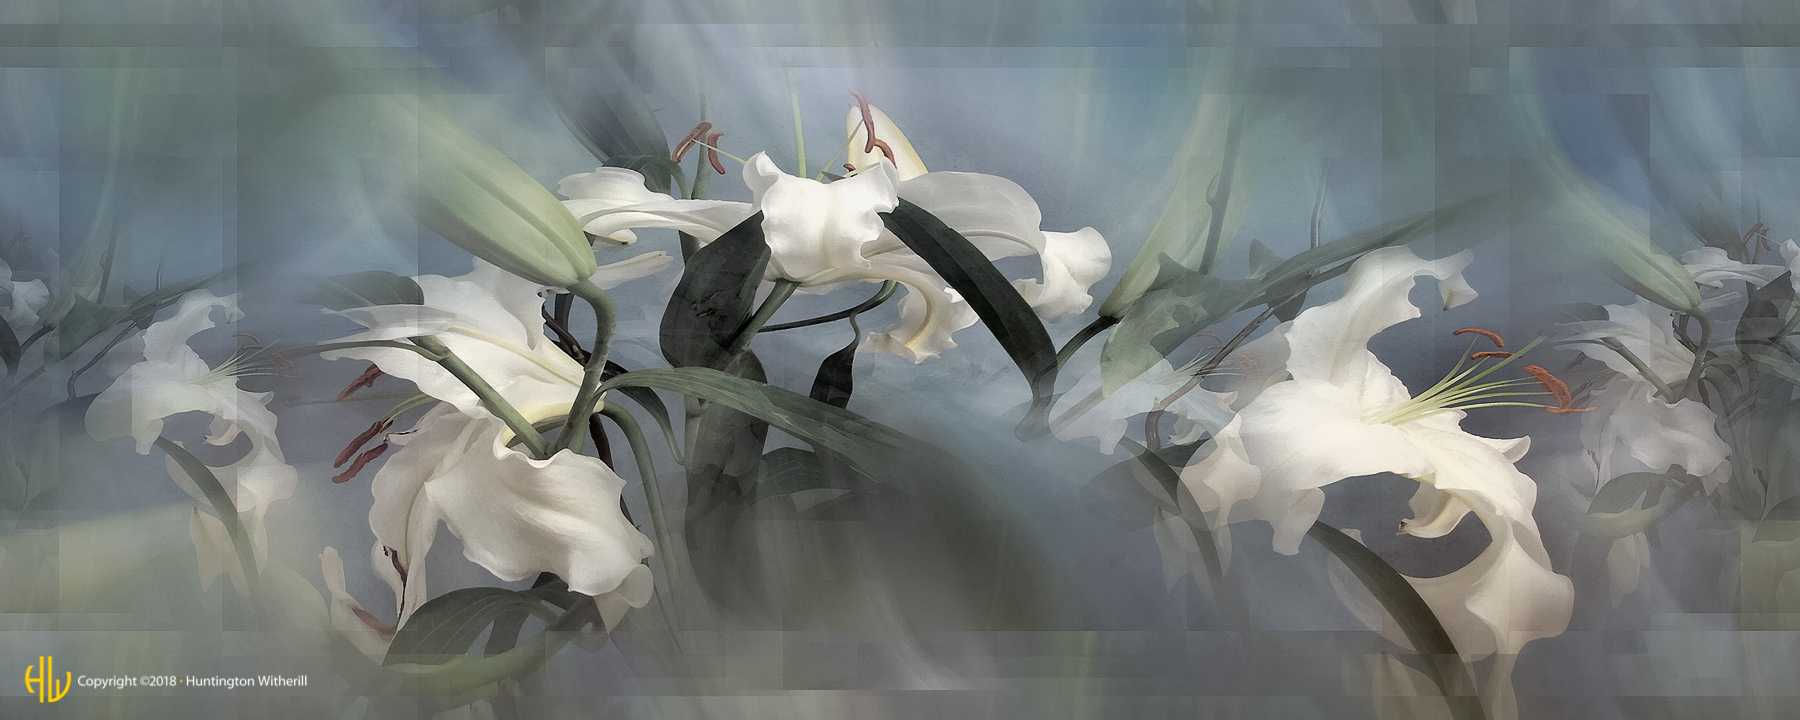 Lilies #52, 2003